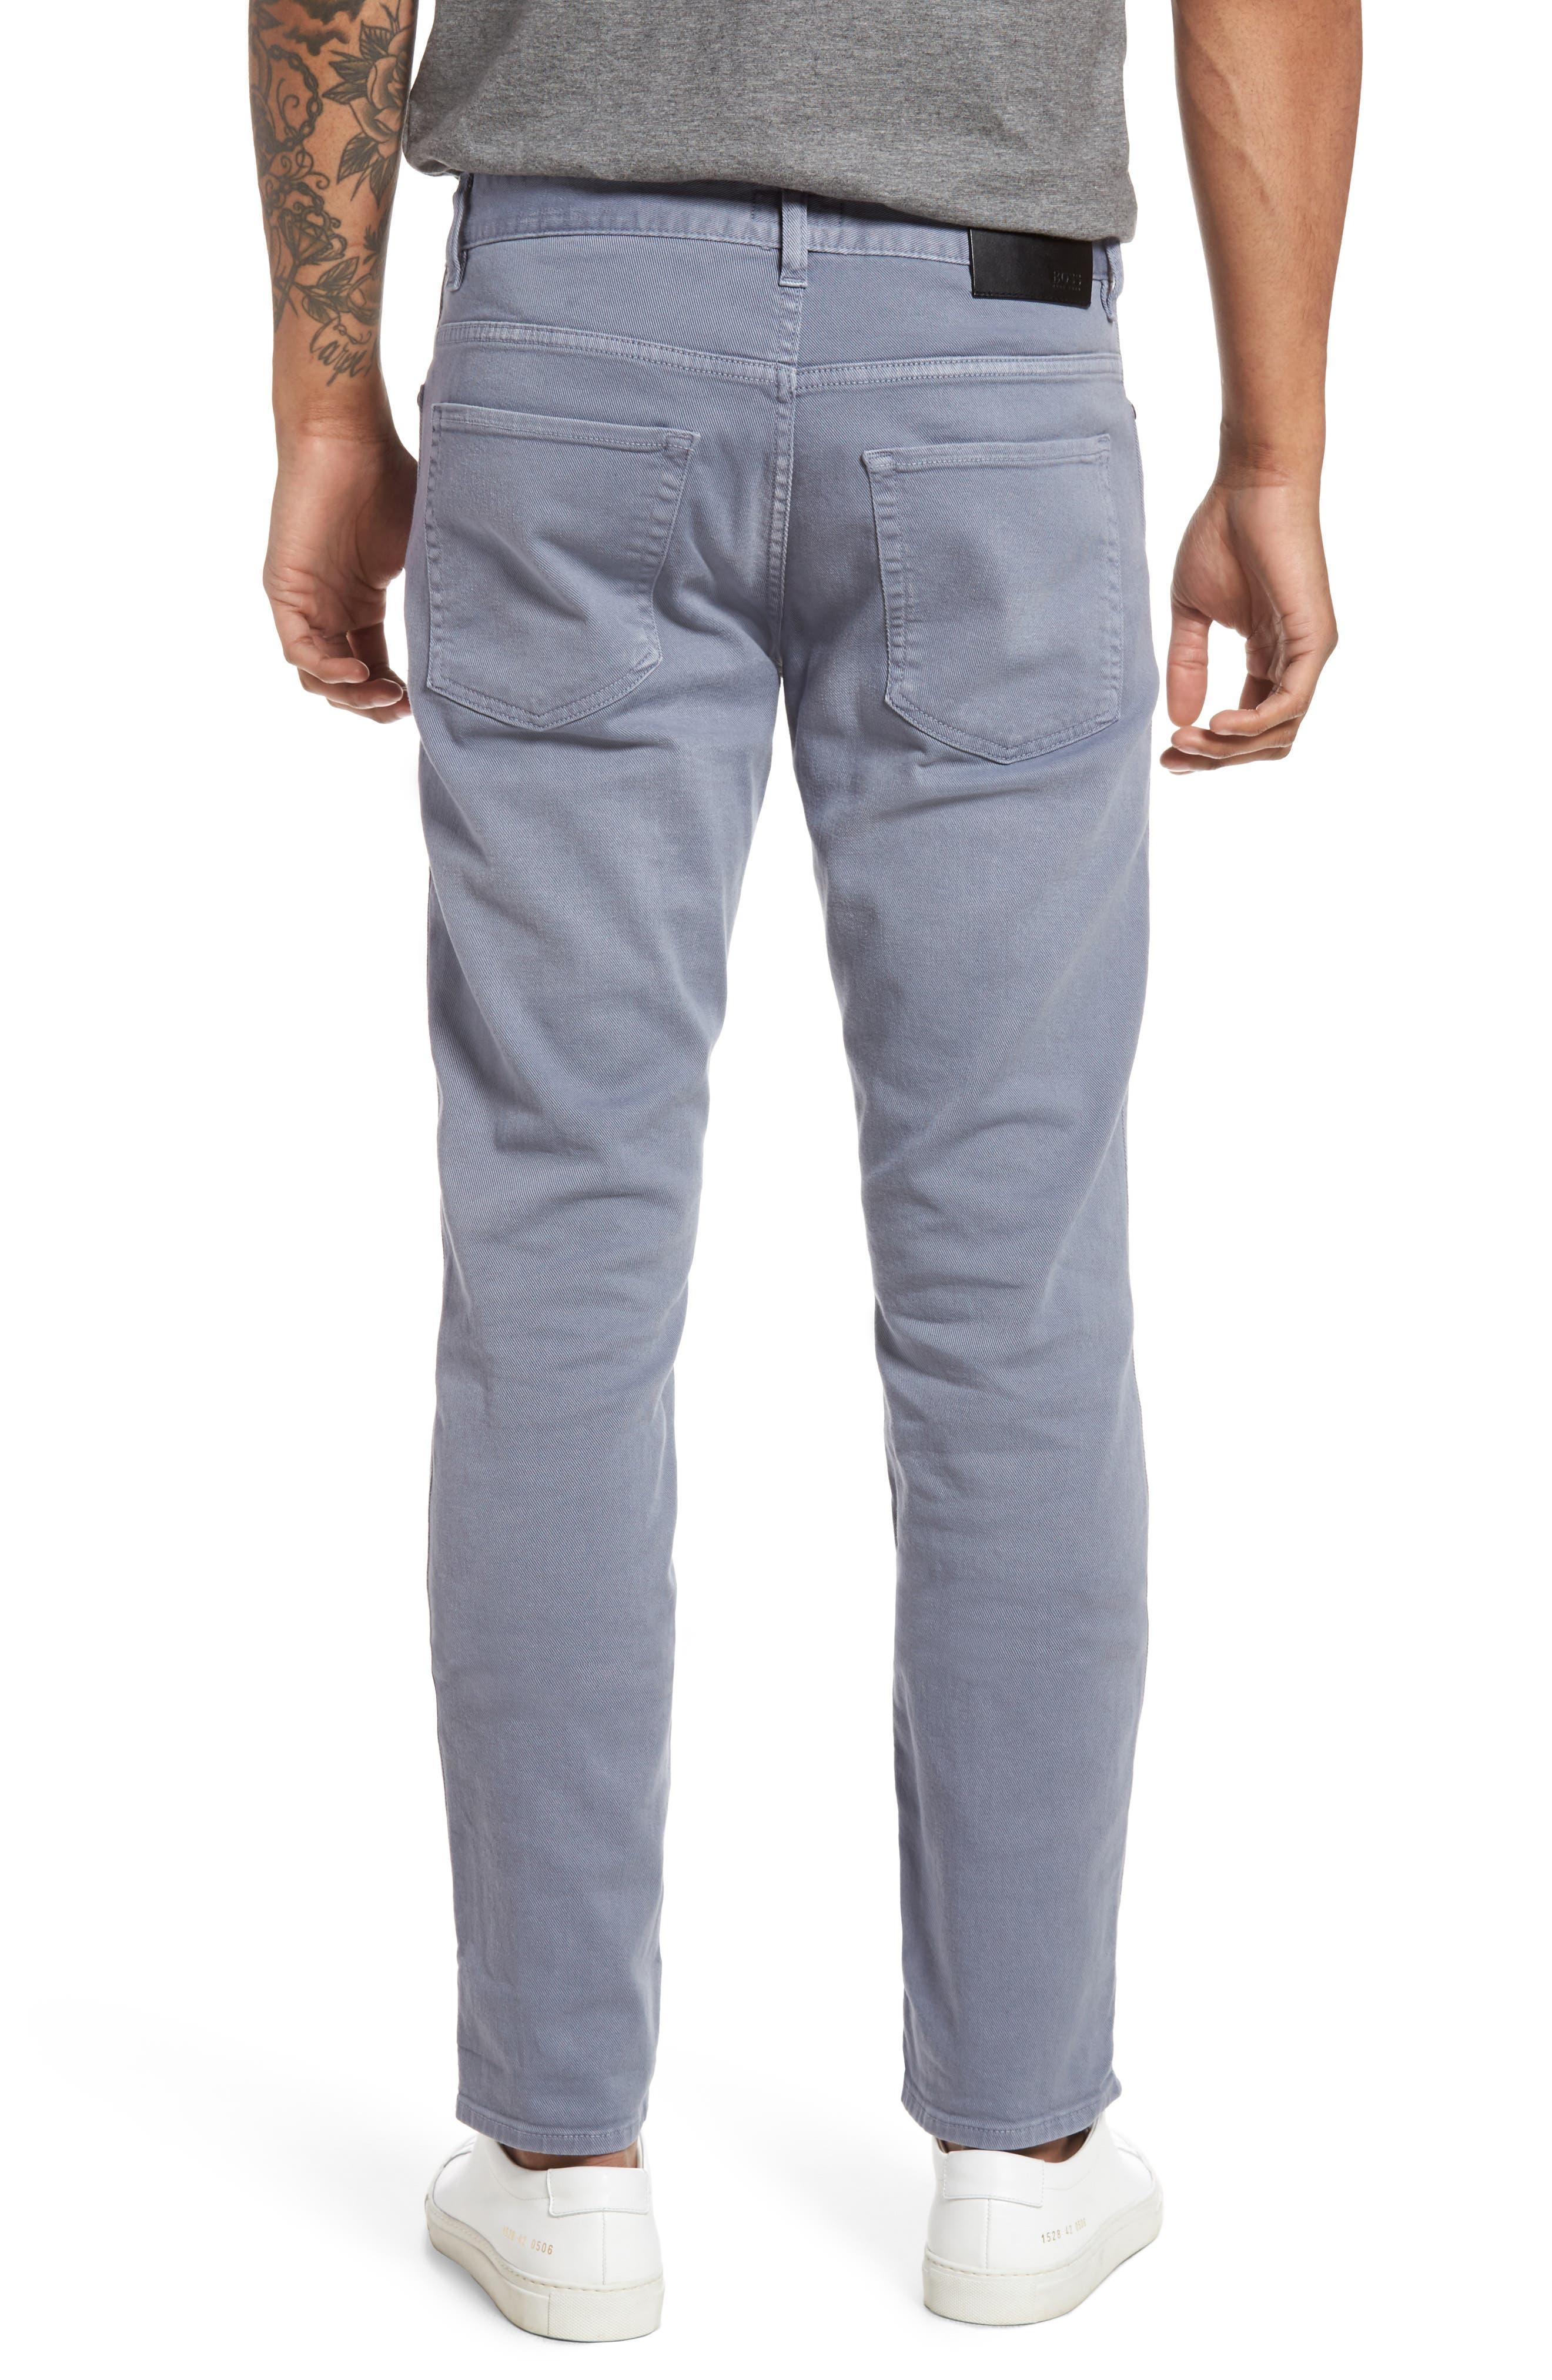 Delaware Slim Fit Jeans,                             Alternate thumbnail 2, color,                             462